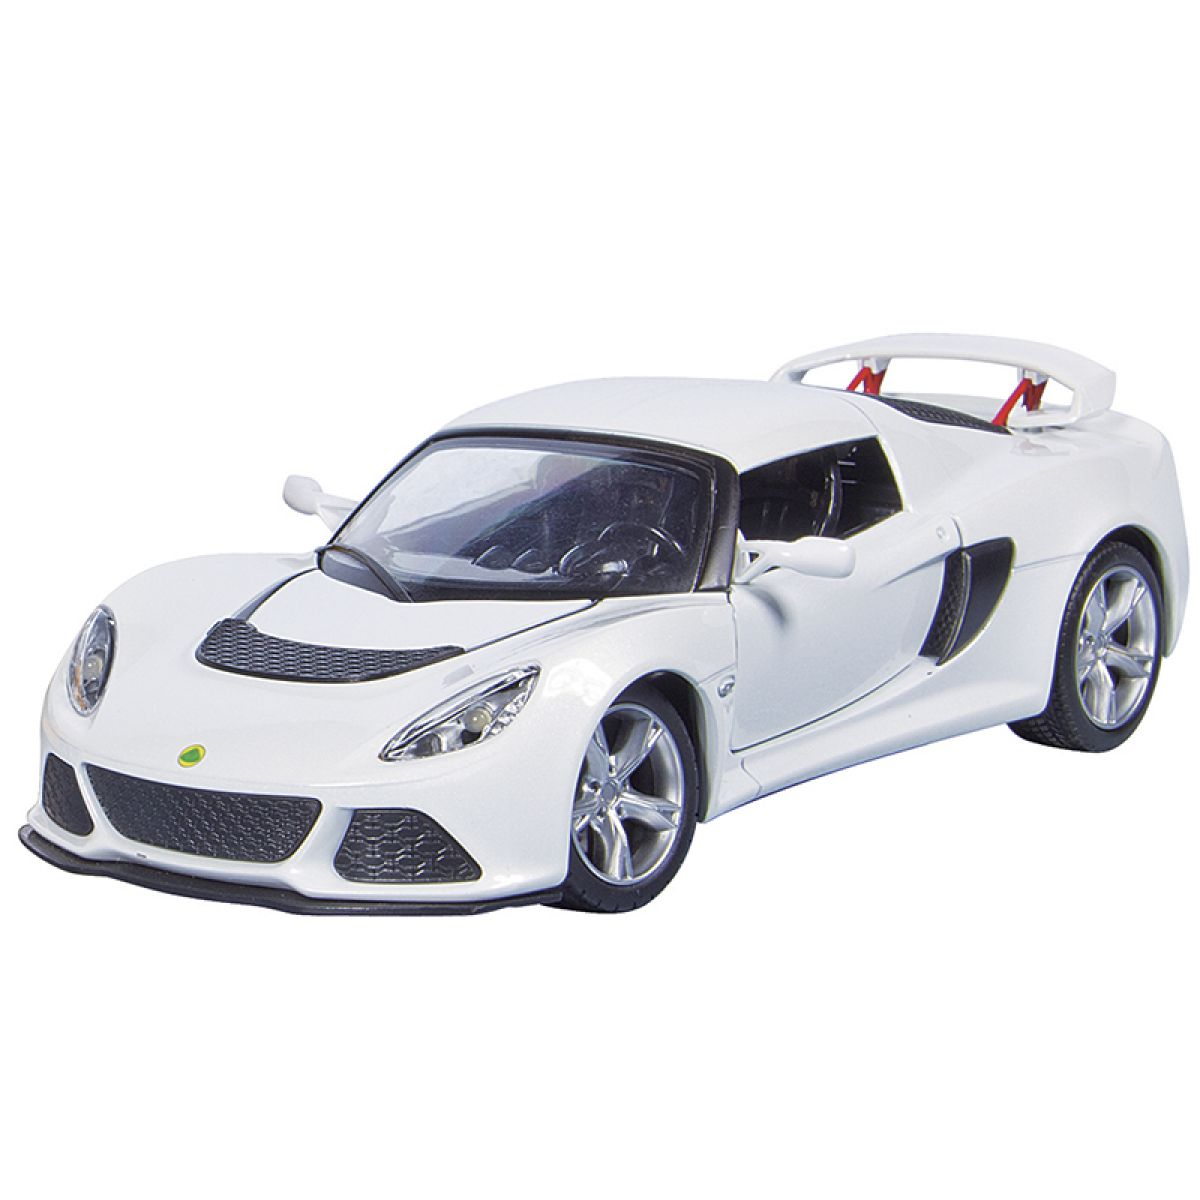 HM Studio kovový model Lotus Exige S 1:22